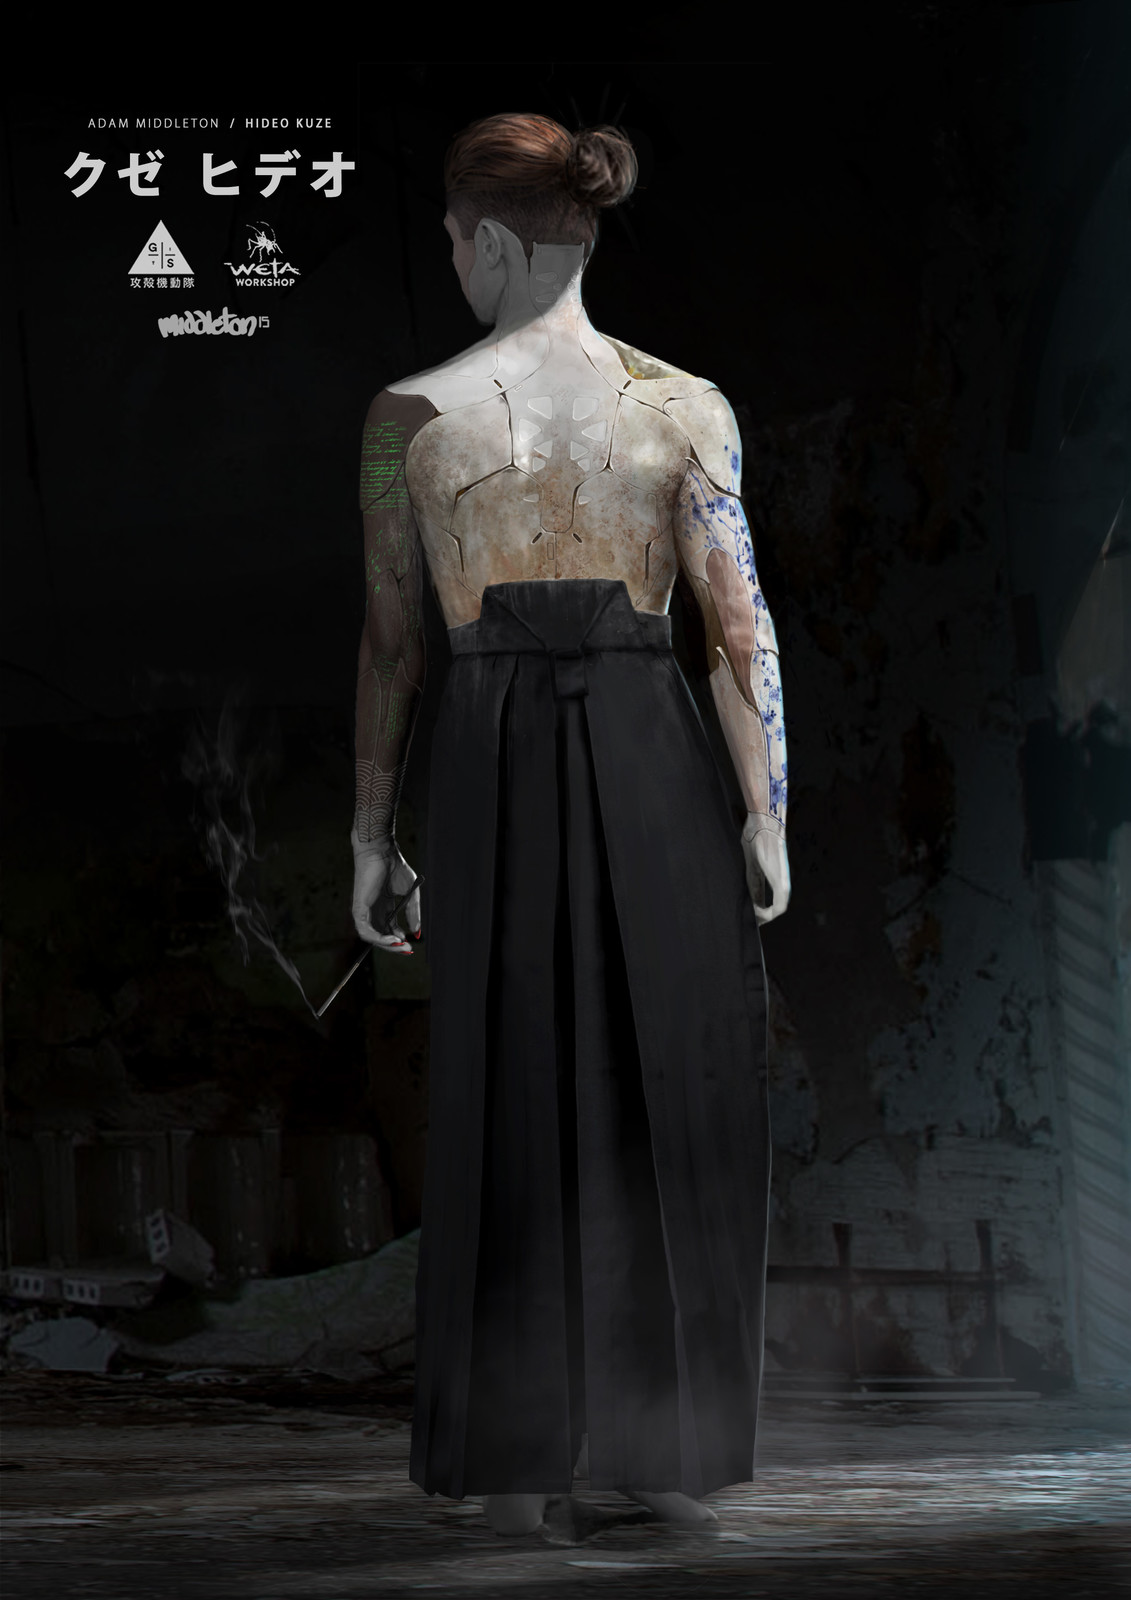 Kuze Back Concept